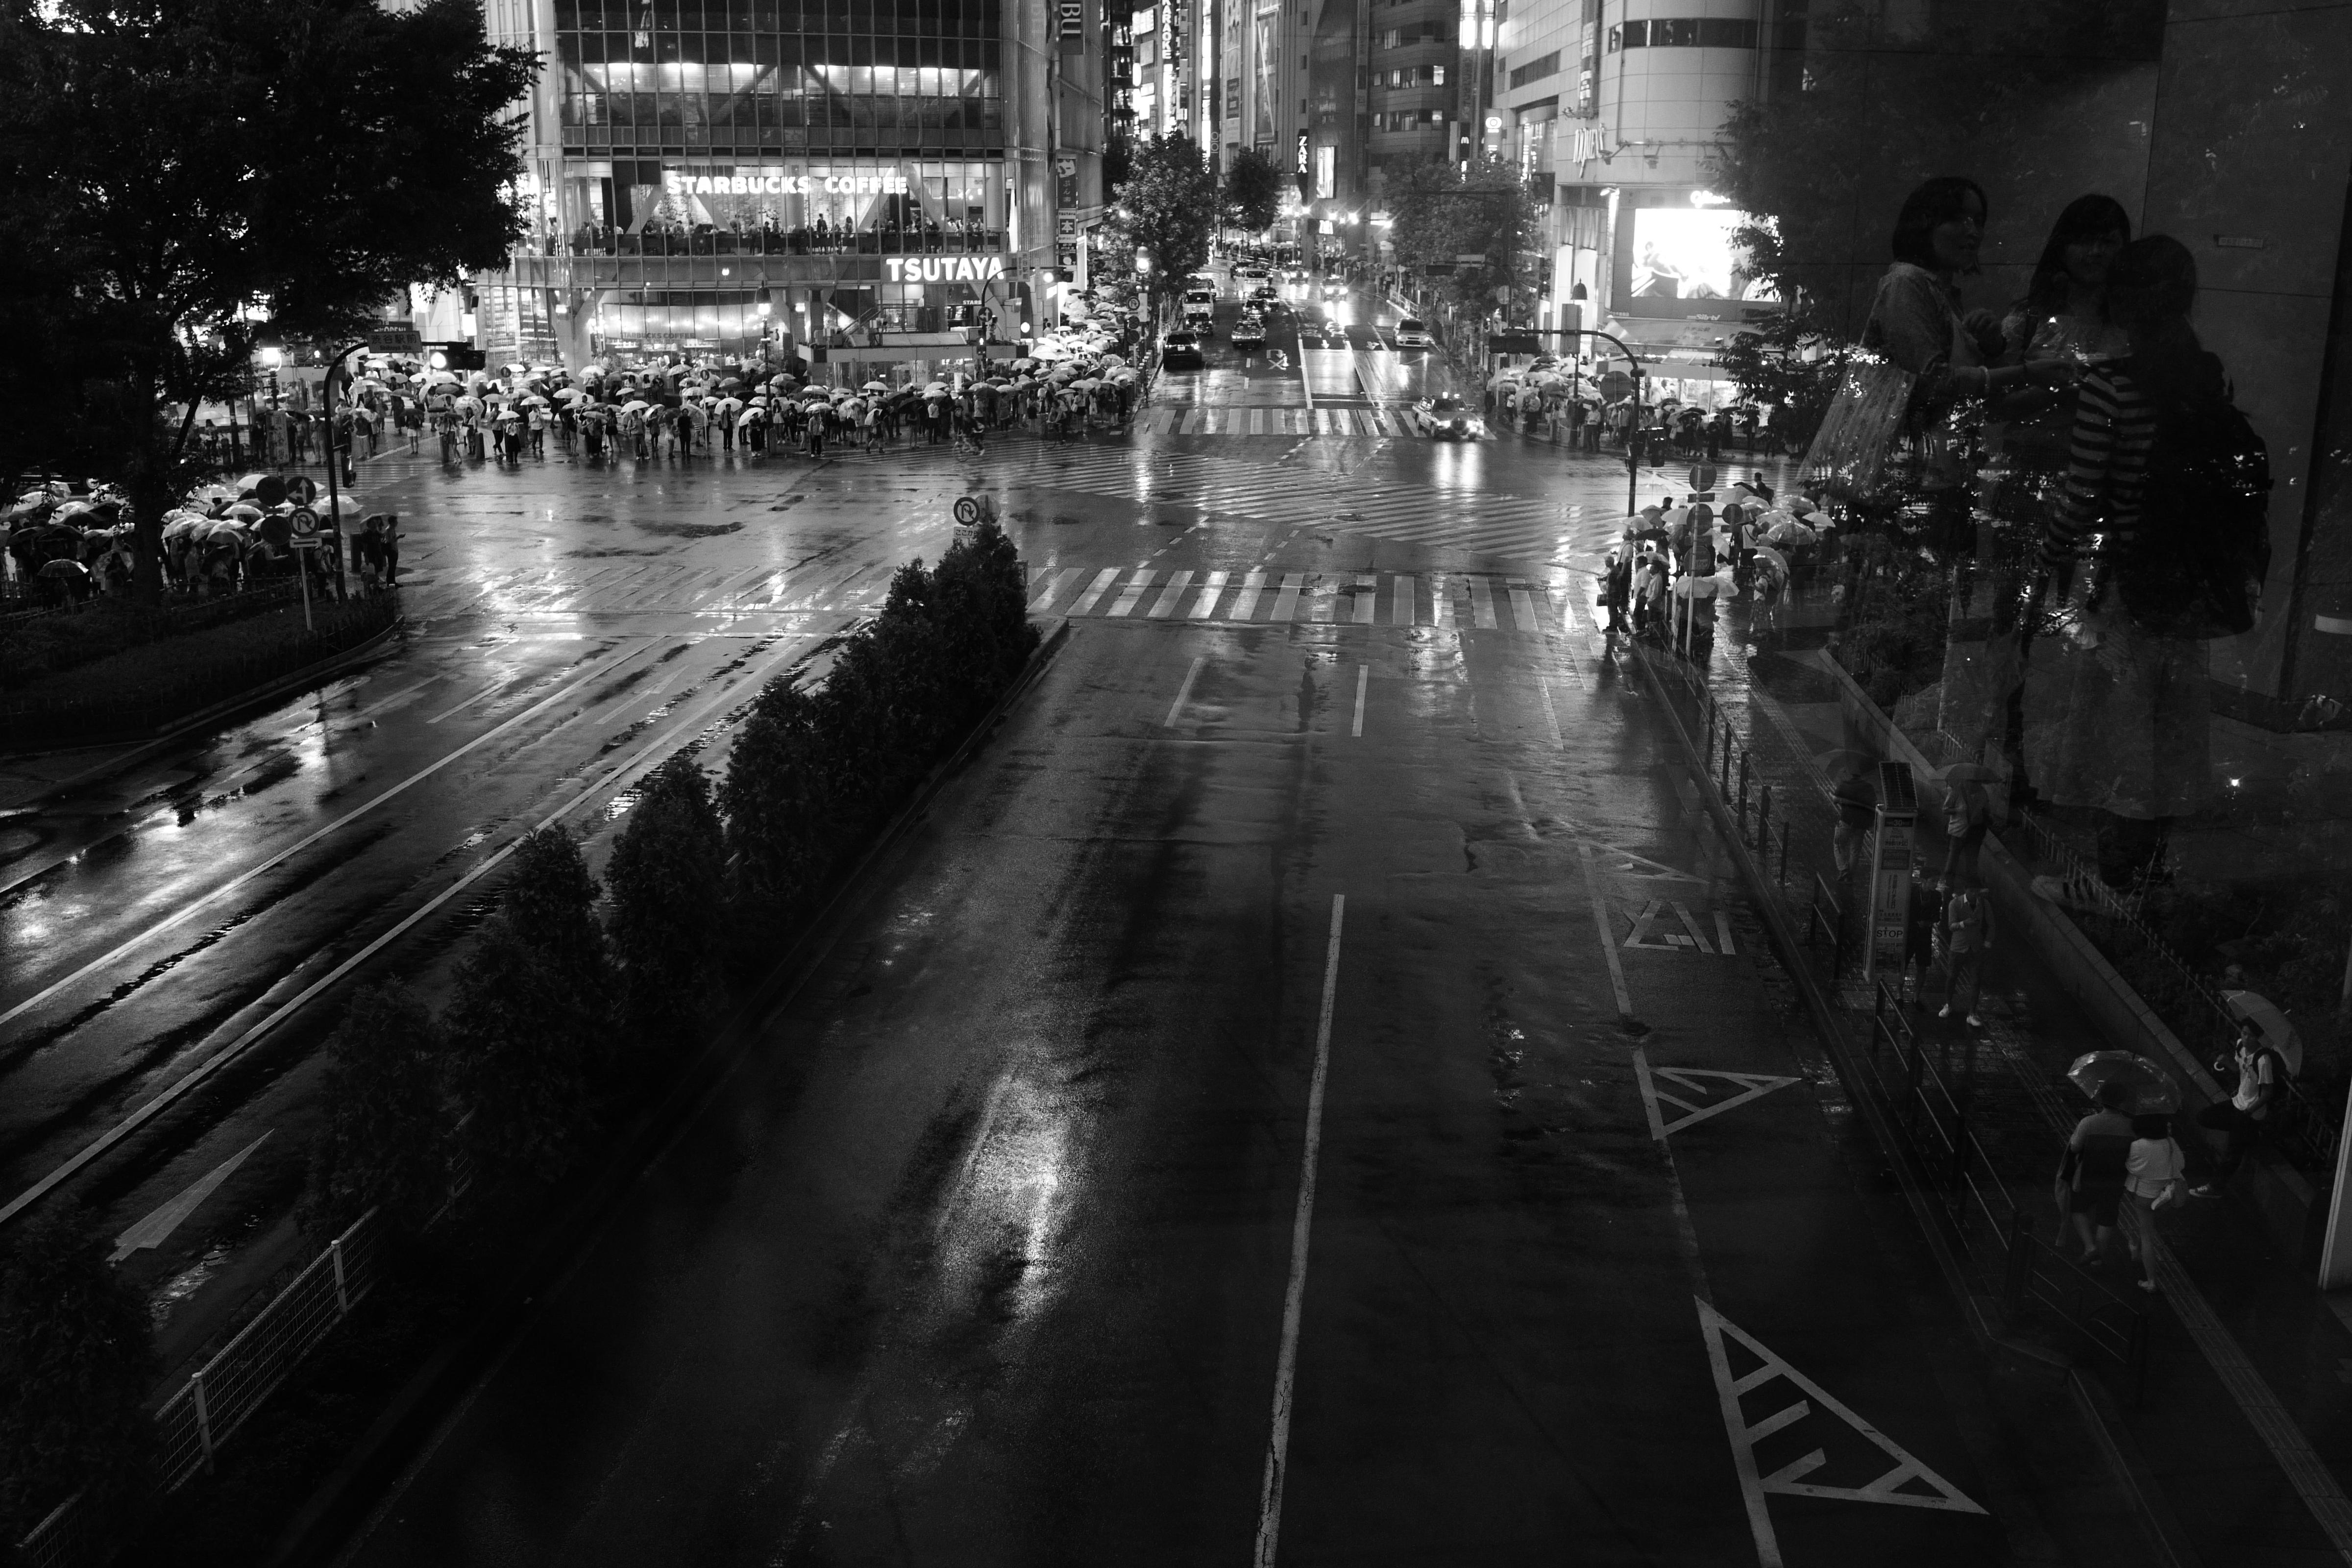 Japan white black monochrome street cityscape night reflection rain  photography Leica Tokyo Jp light weather bw